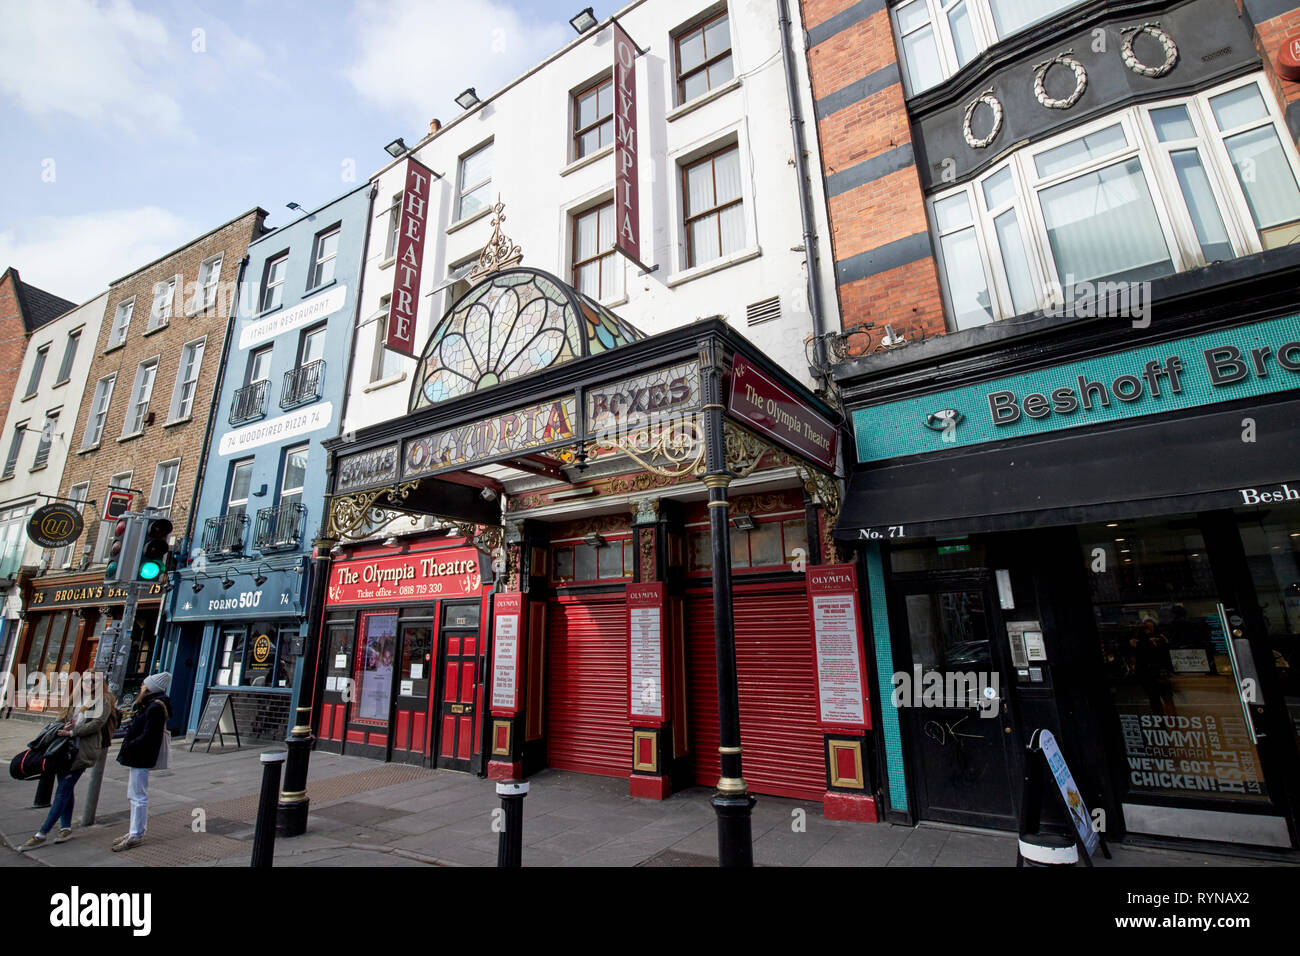 The Olympia Theatre Dame Street Dublin Republic of Ireland Europe Stock Photo